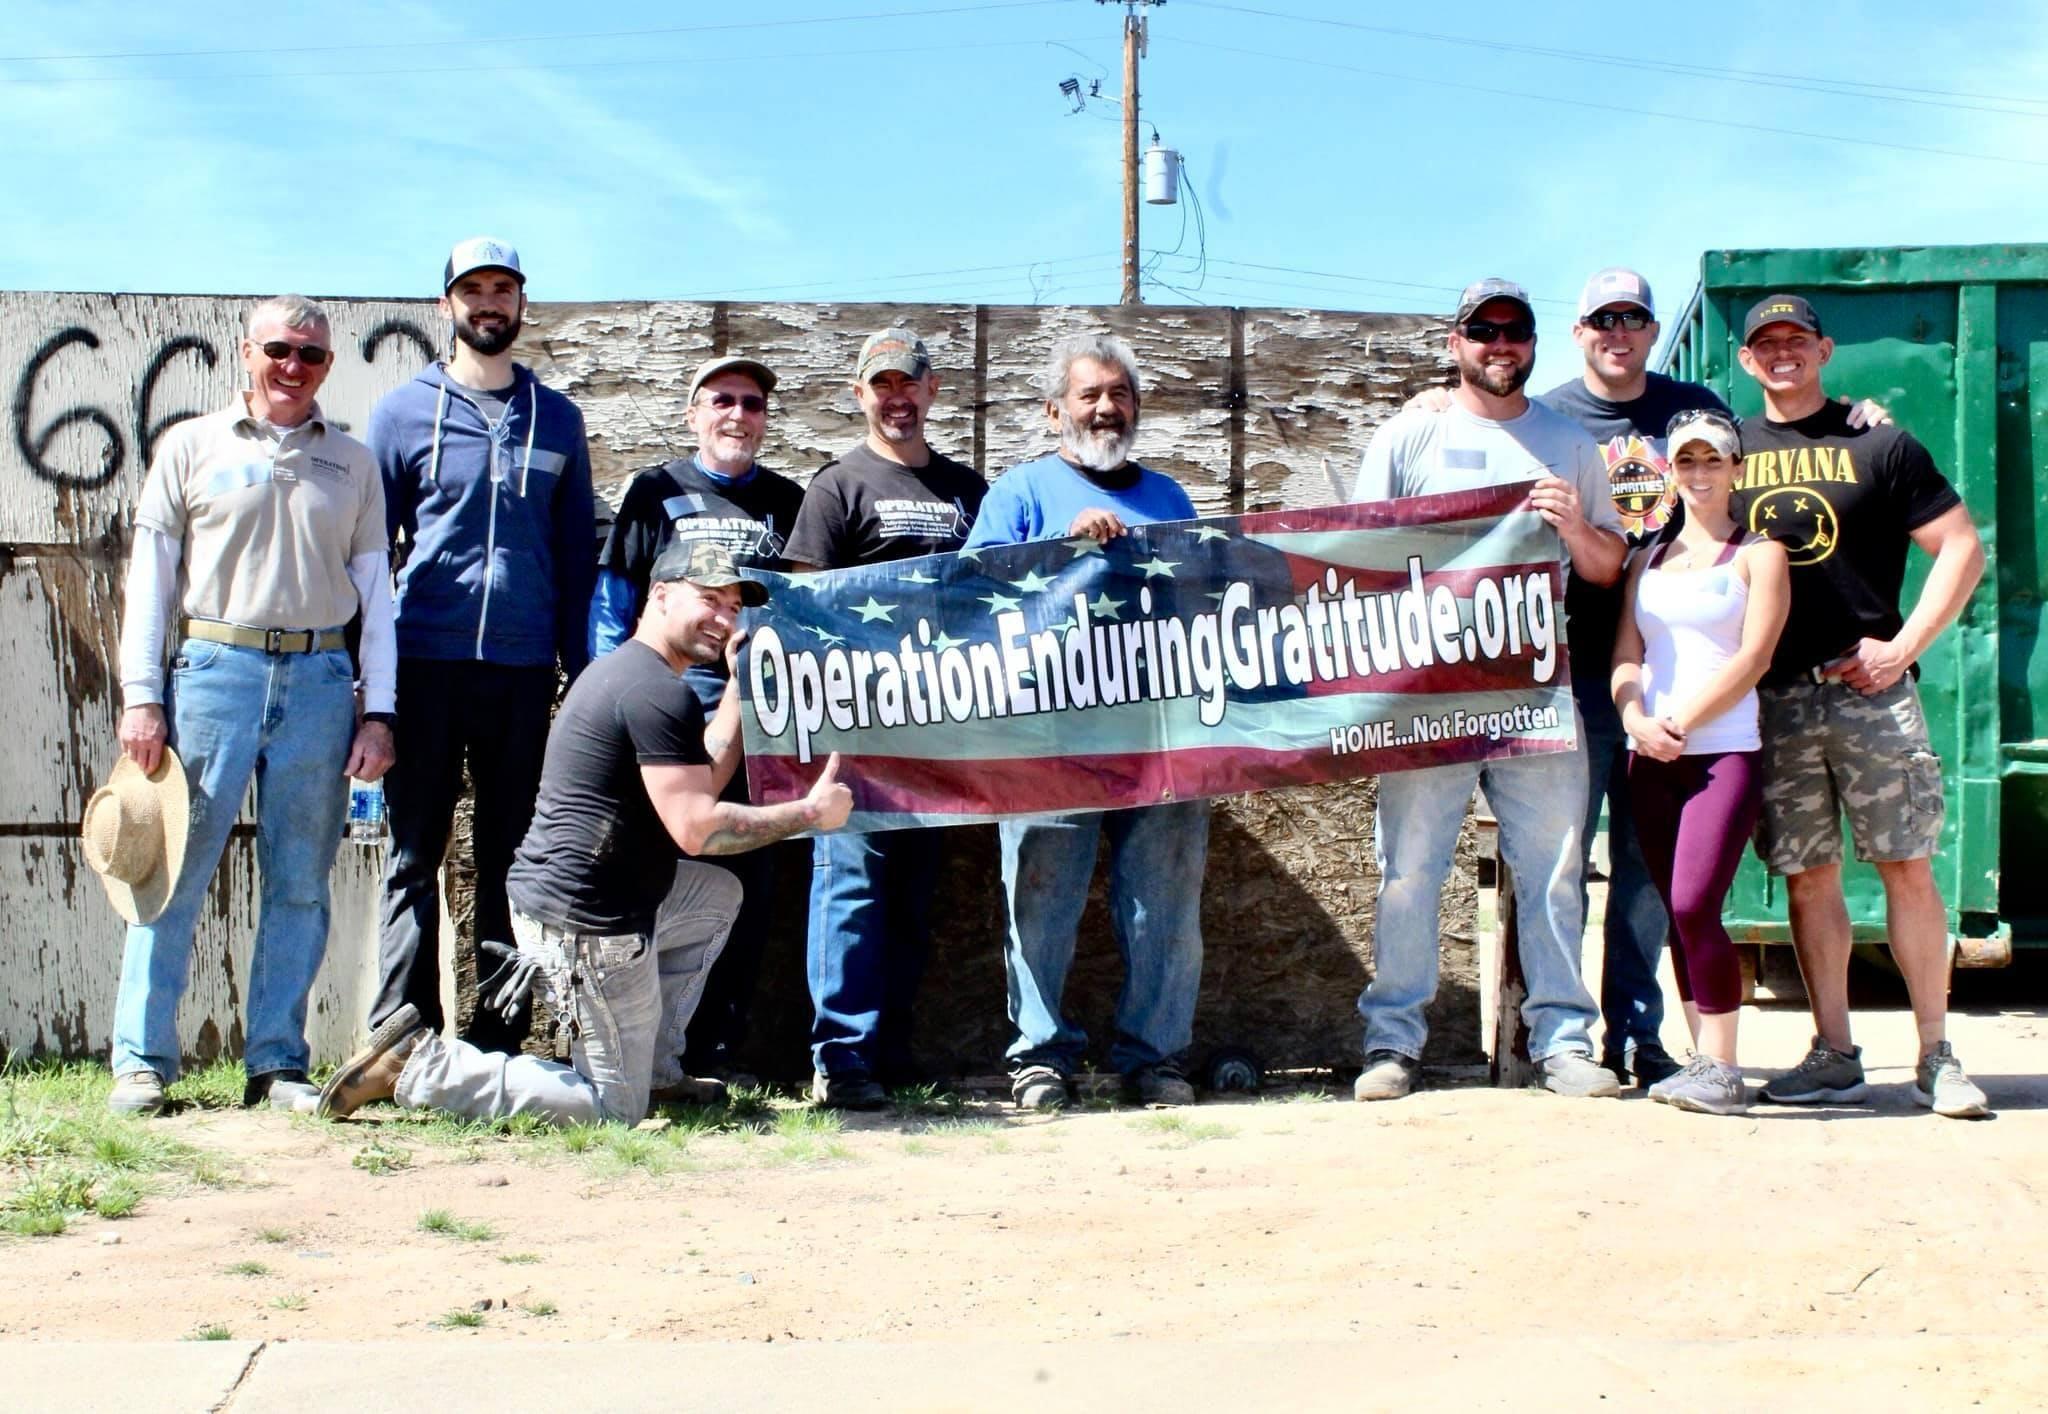 Home Tour and Celebration for Veteran Gilbert Lopez's Rebuilt Home - Operation Enduring Gratitude